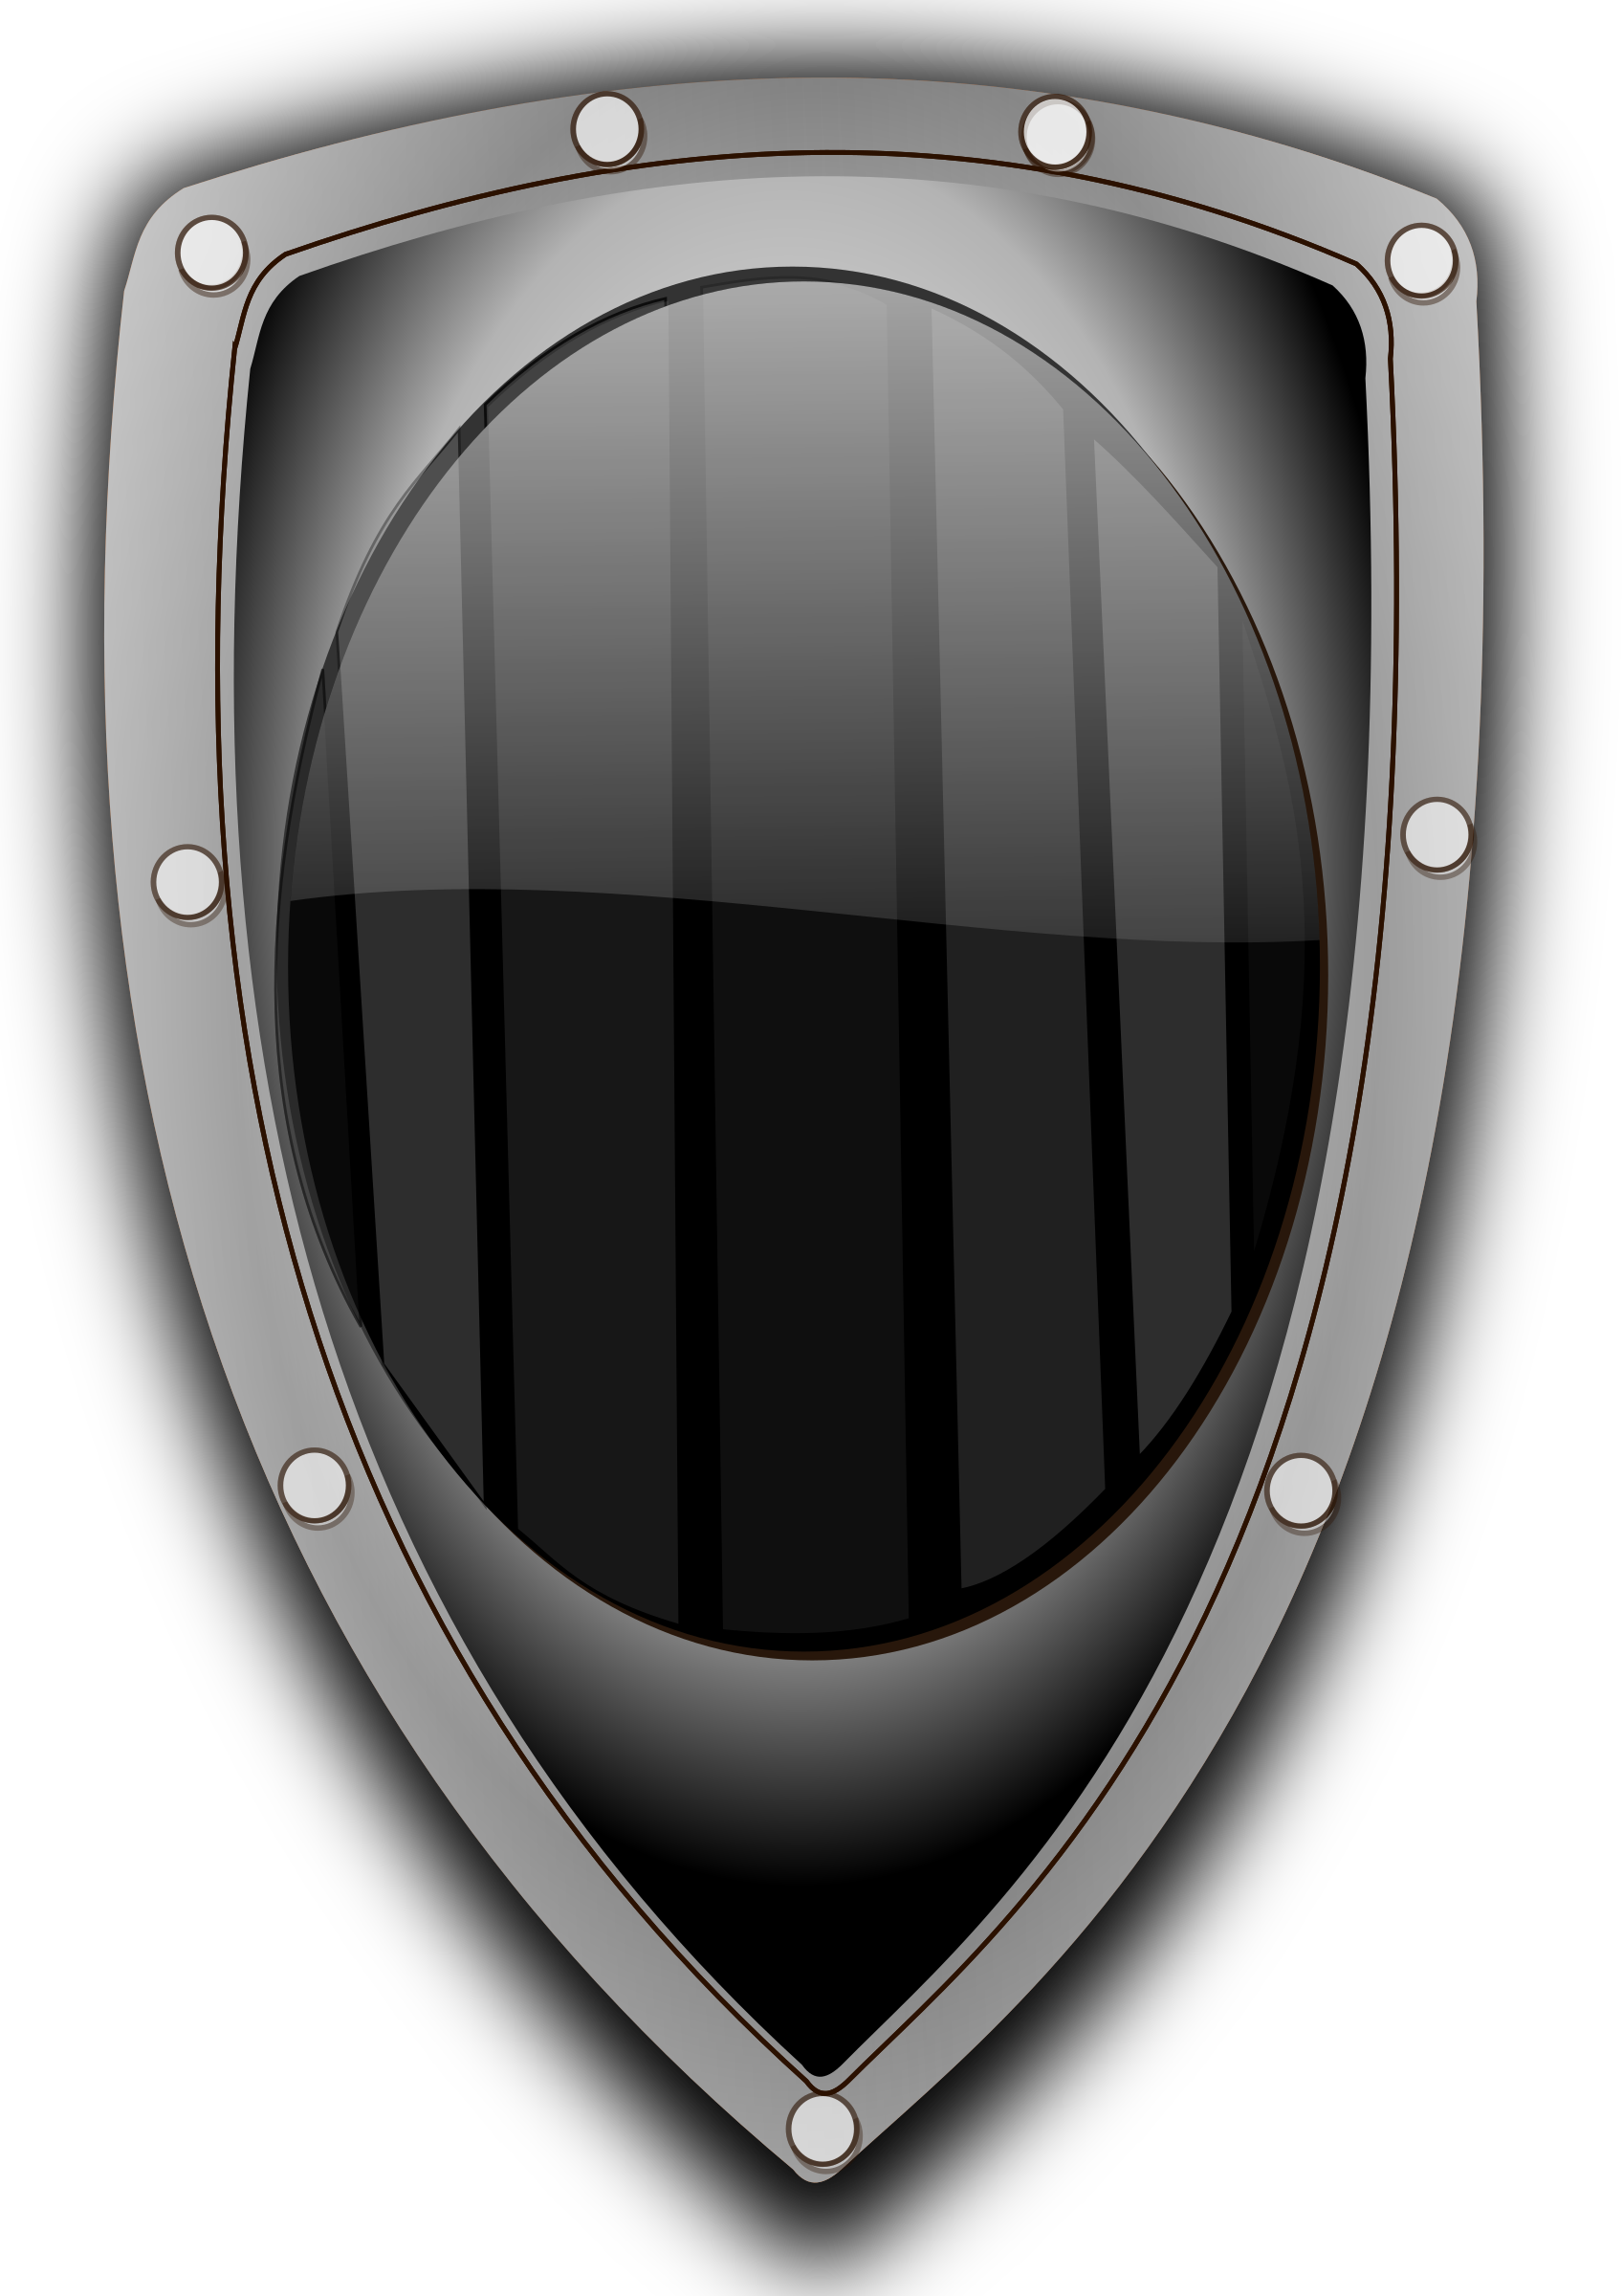 Warrior clipart shield. Metal big image png